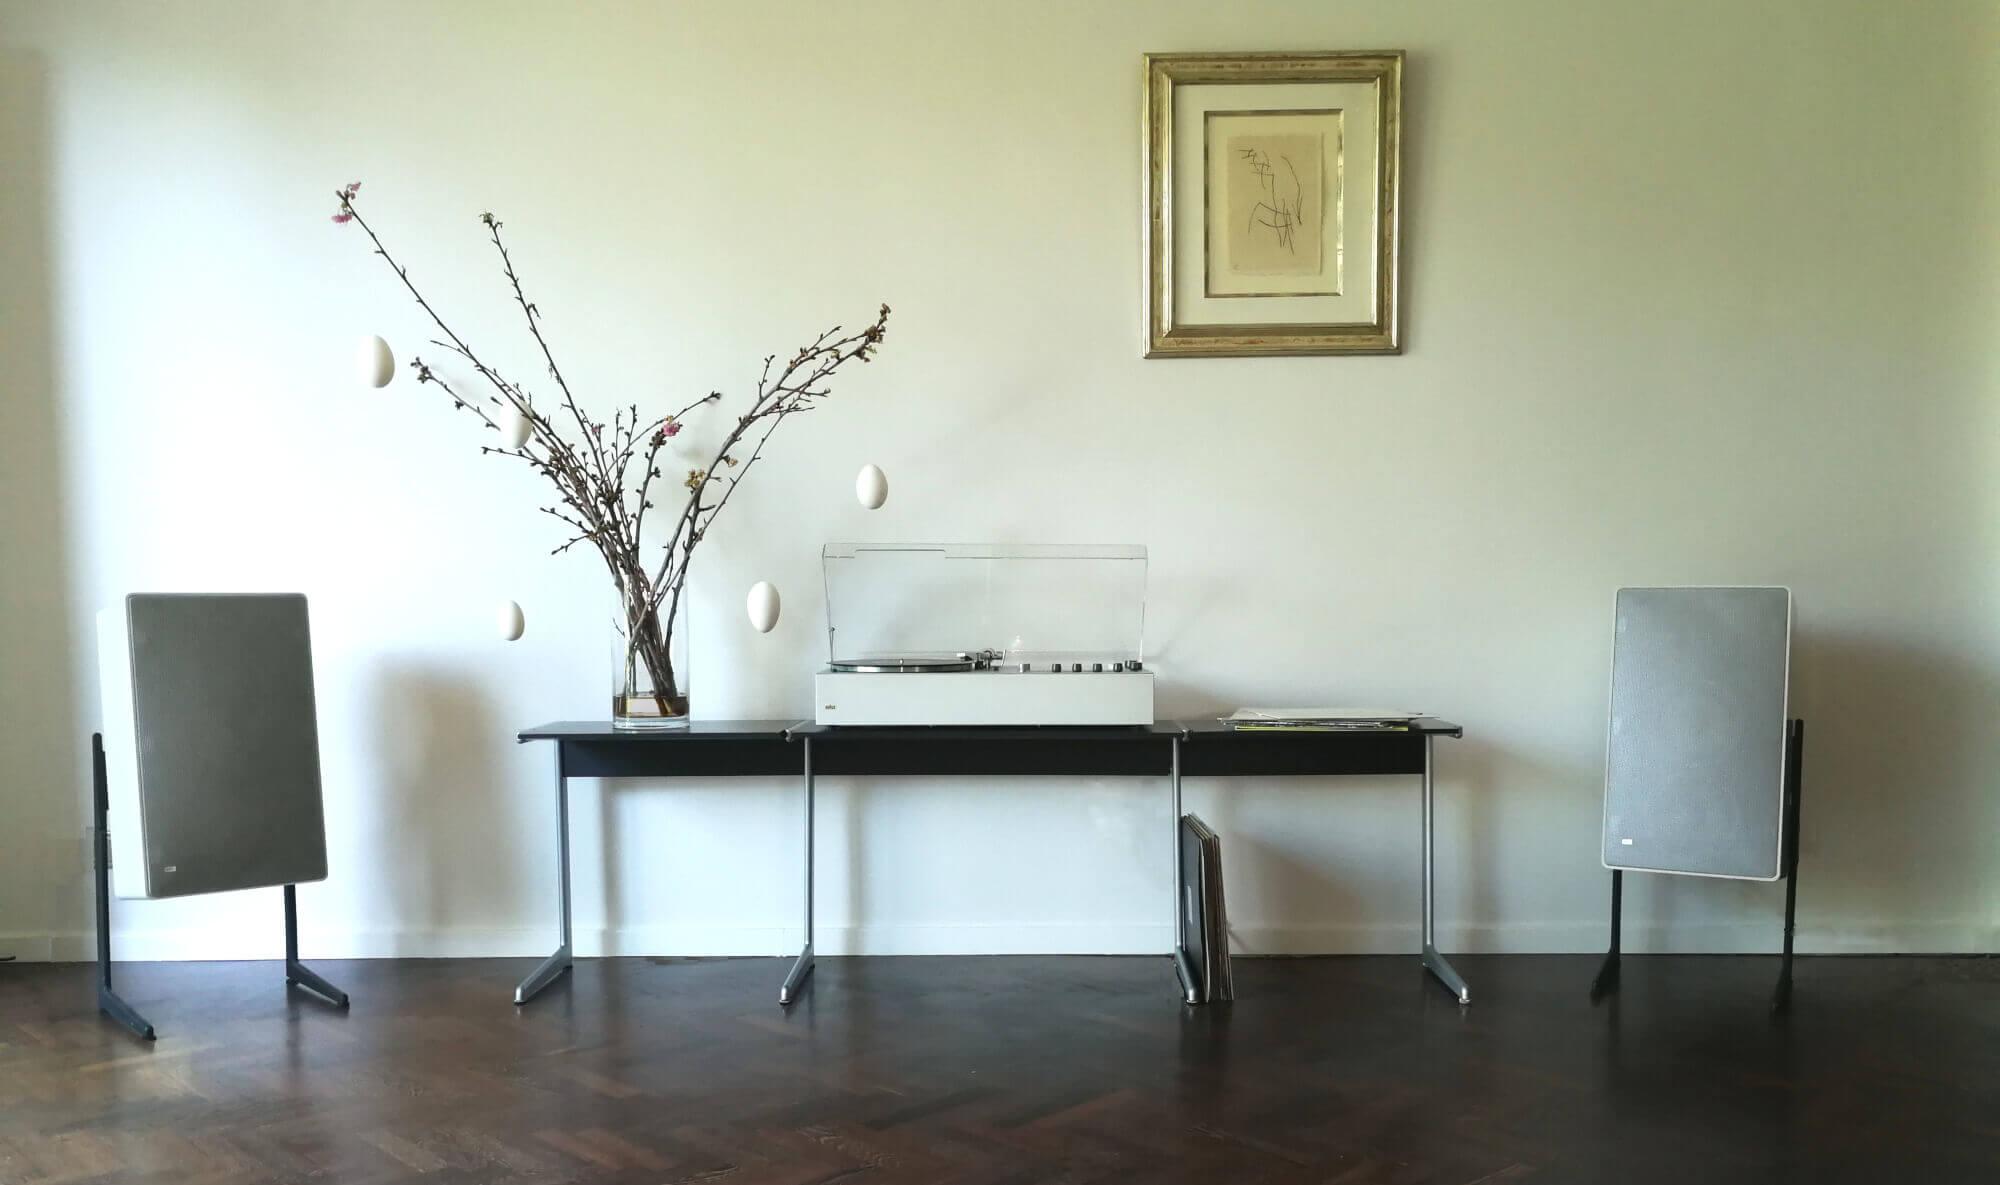 braun audio 310 white & kangaroo & L 710 with LF700 speakerstands